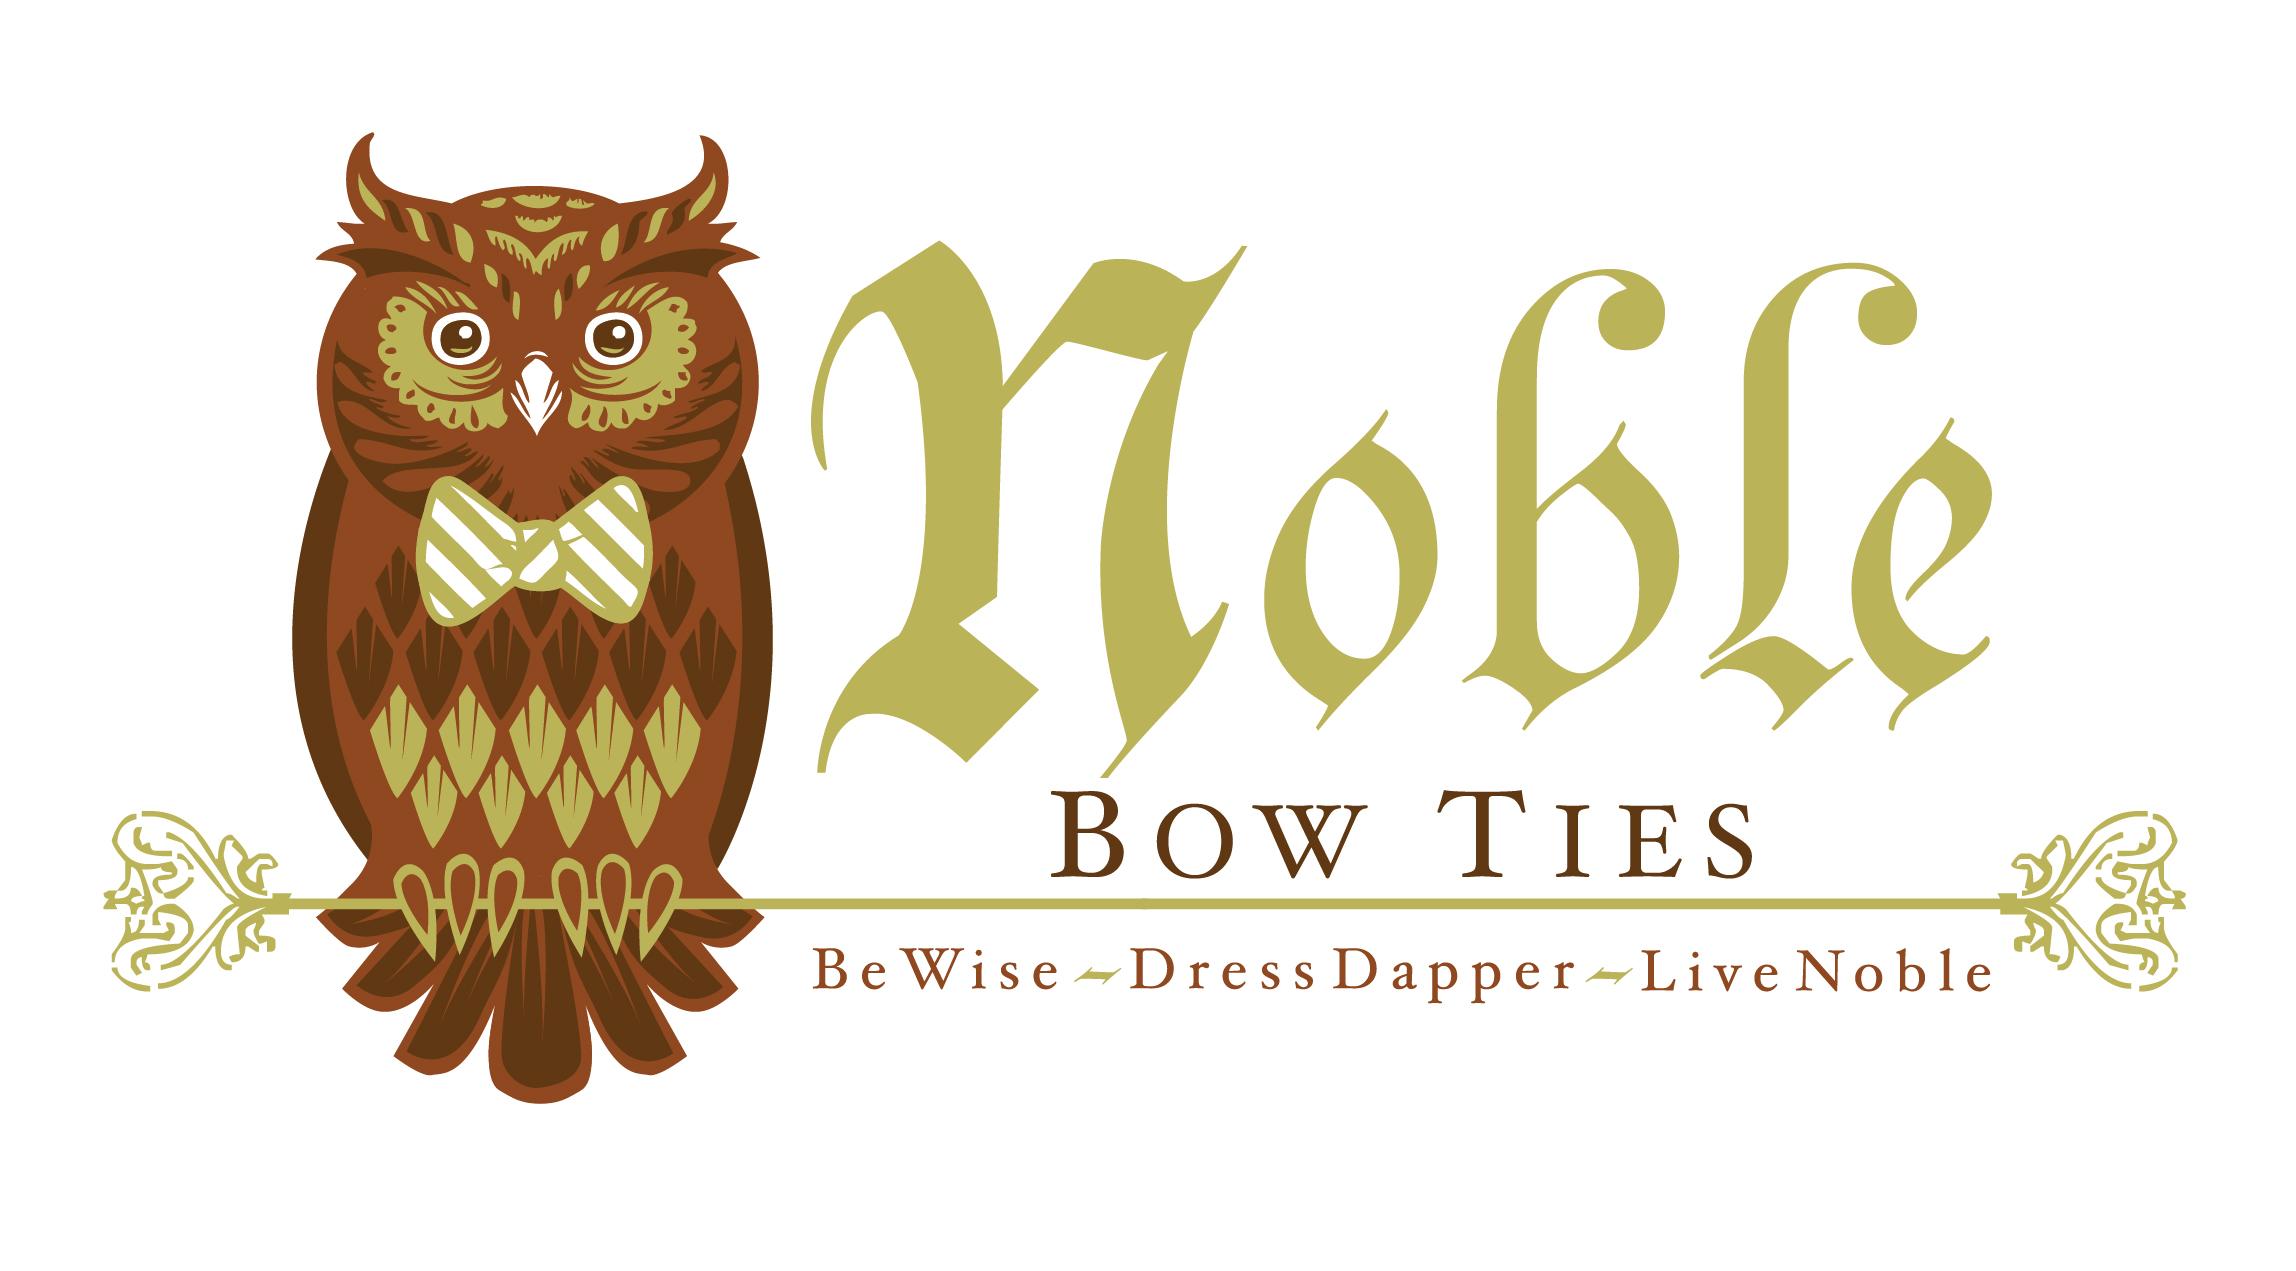 Noble Bow Ties. San Diego, CA